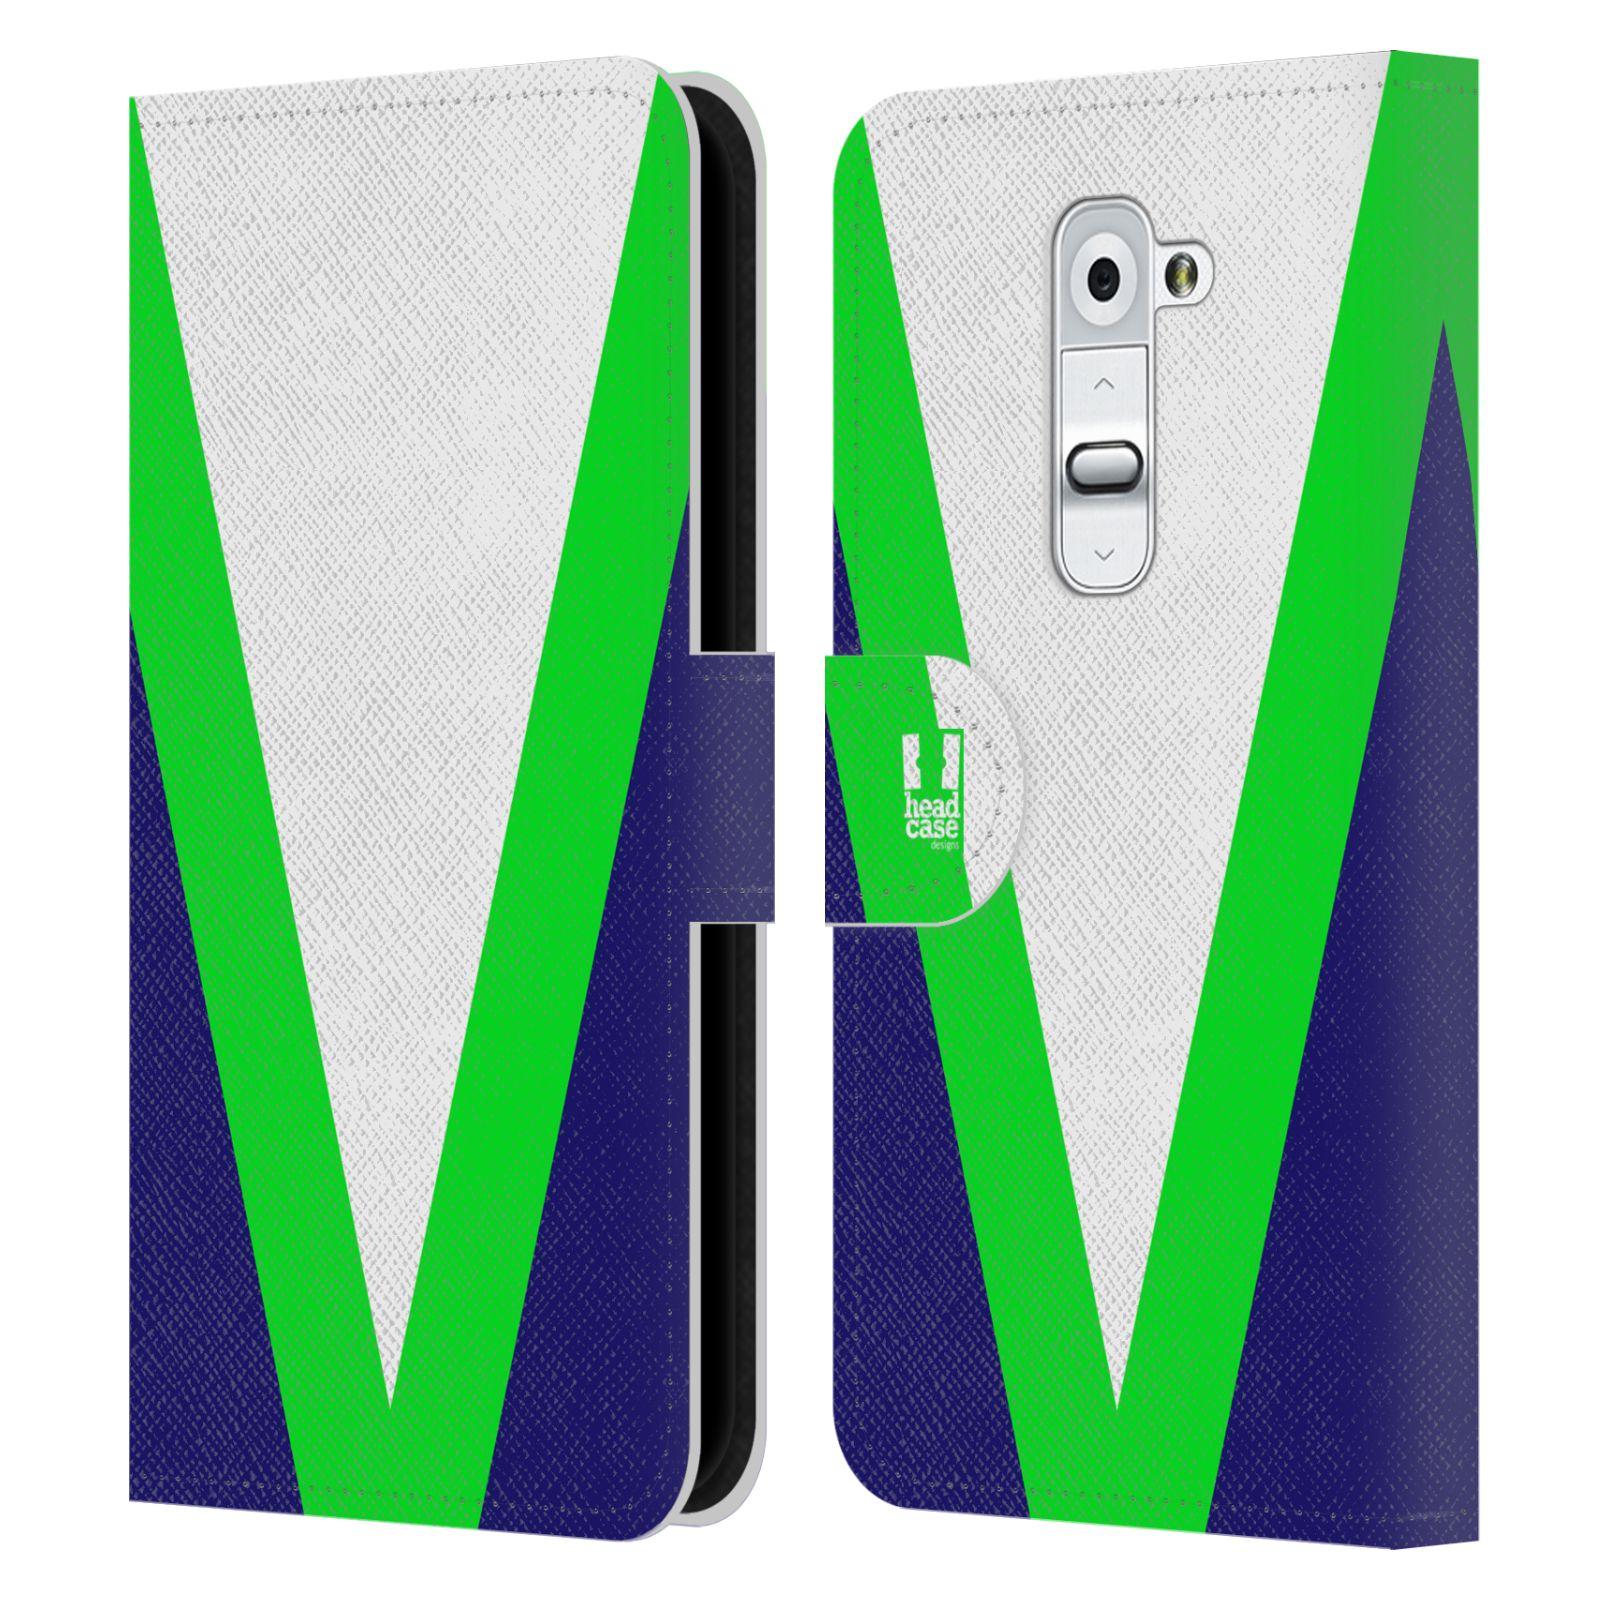 HEAD CASE Flipové pouzdro pro mobil LG G2 barevné tvary zelená a modrá